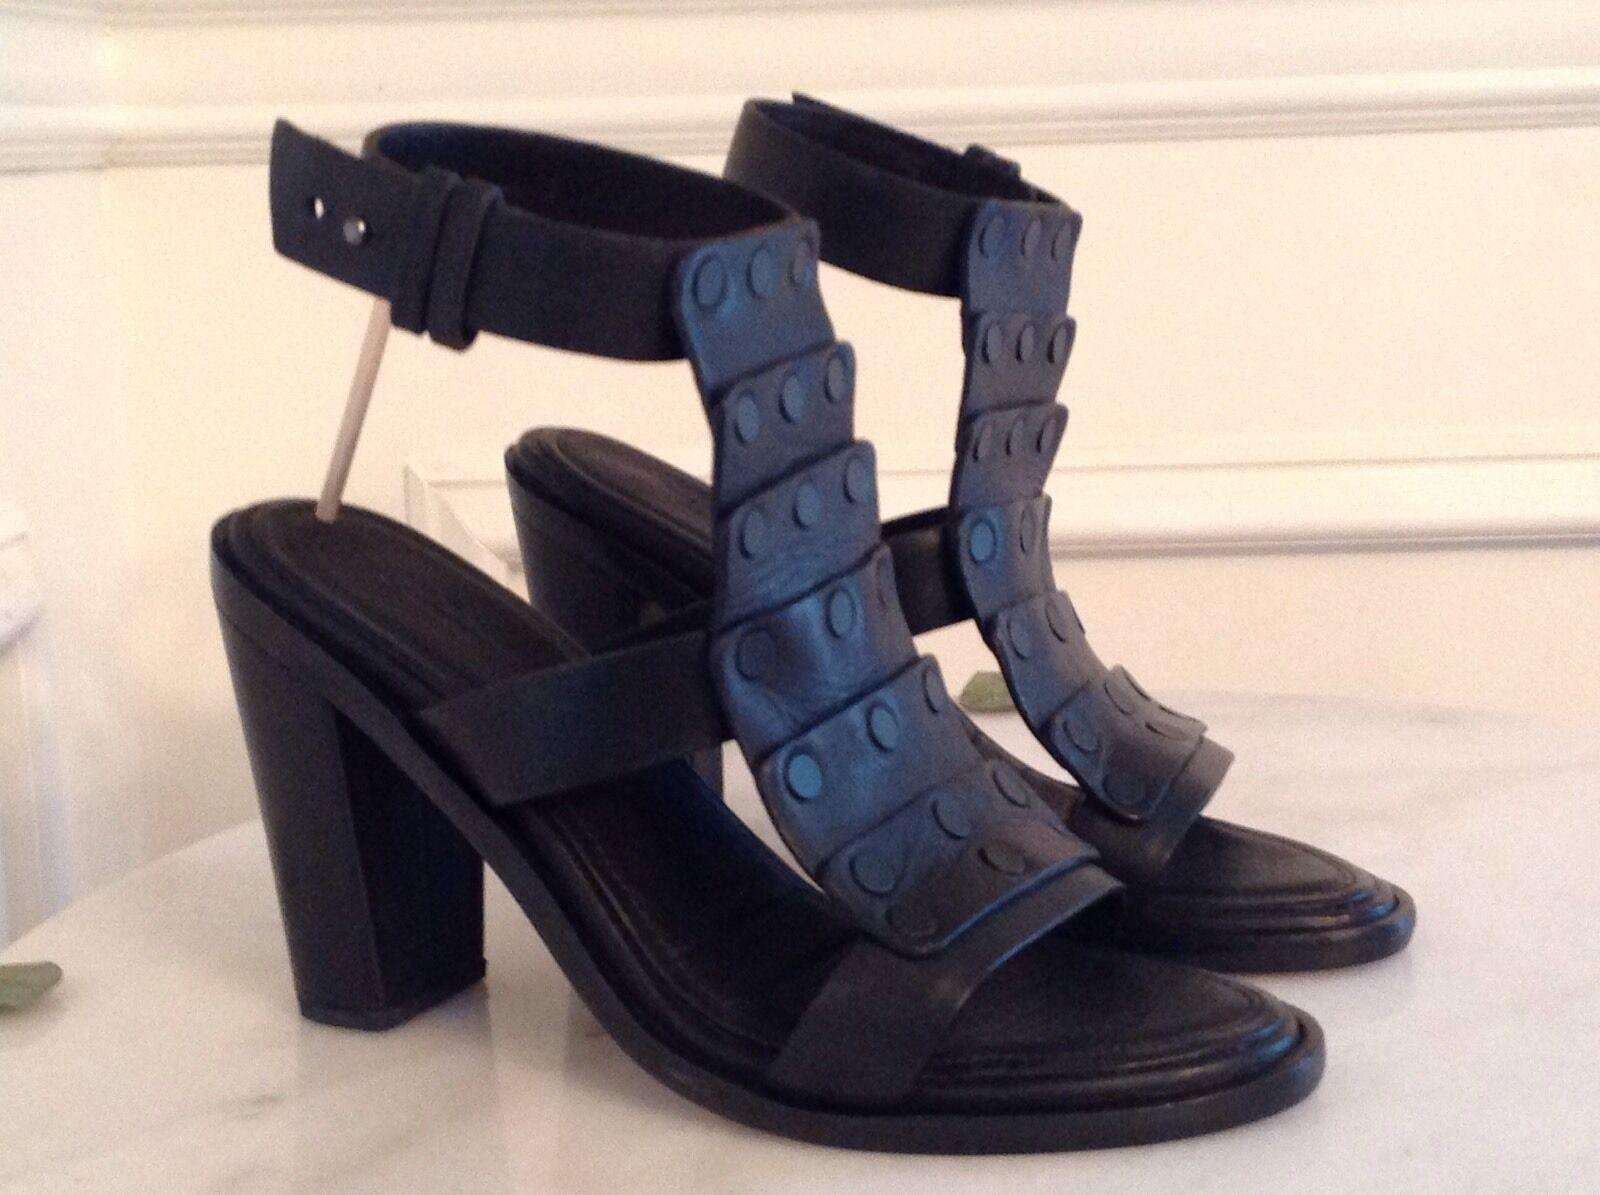 NEW Rag & Bone Black Deane Leather Ankle T-Strap Sandals Size 35